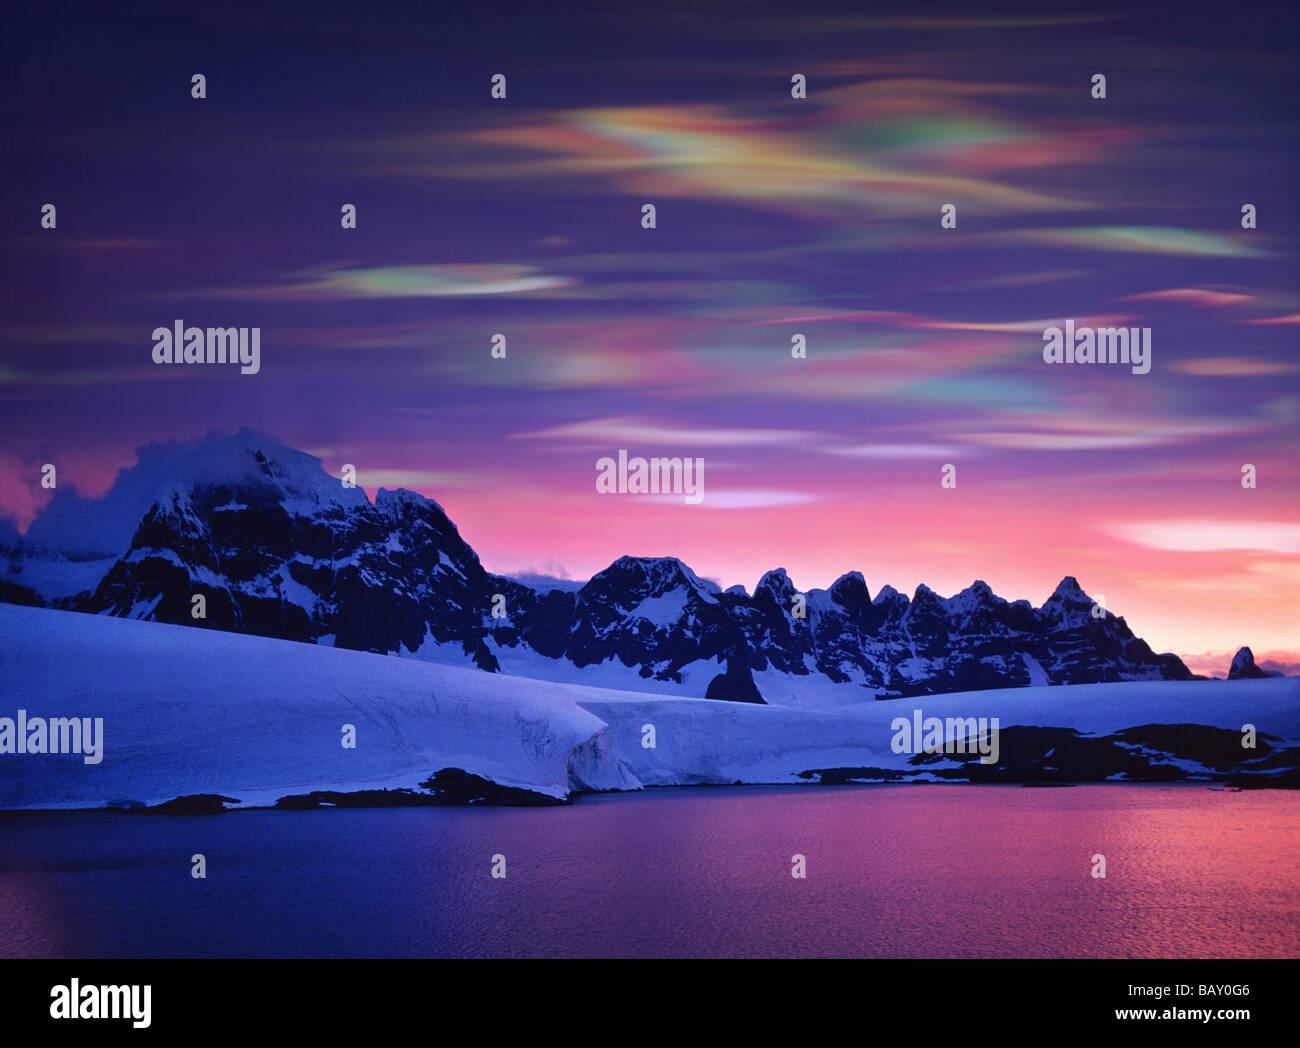 Pearl clouds, nacreous clouds, Polar Stratospheric Clouds, These clouds indicate global warming, Antarctic Peninsula, - Stock Image